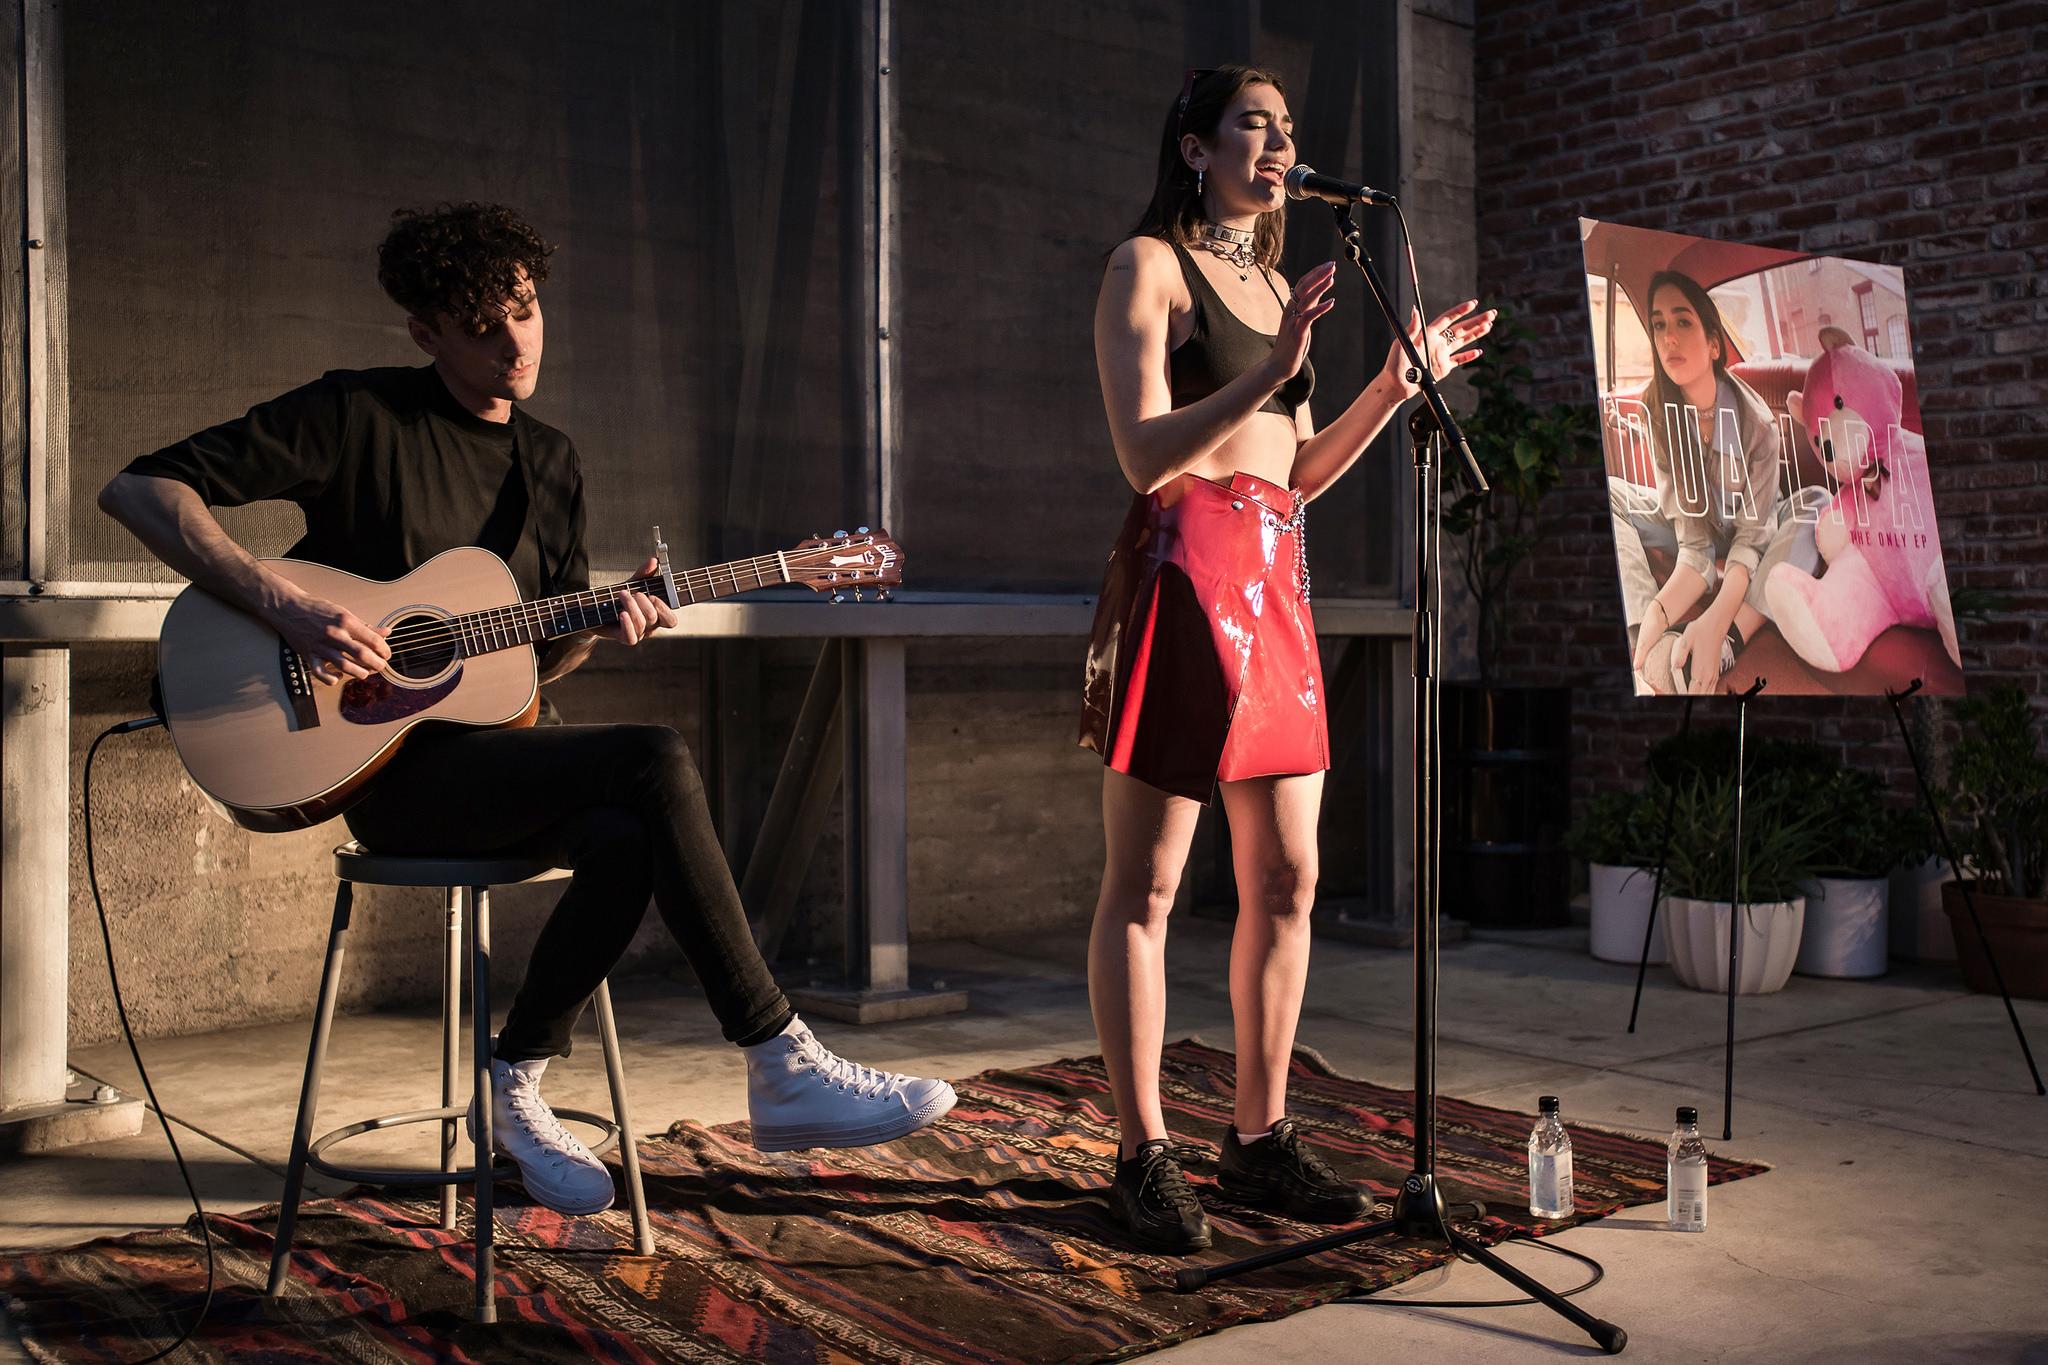 Dua Lipa durante una performance, Justin Higuchi/flickr